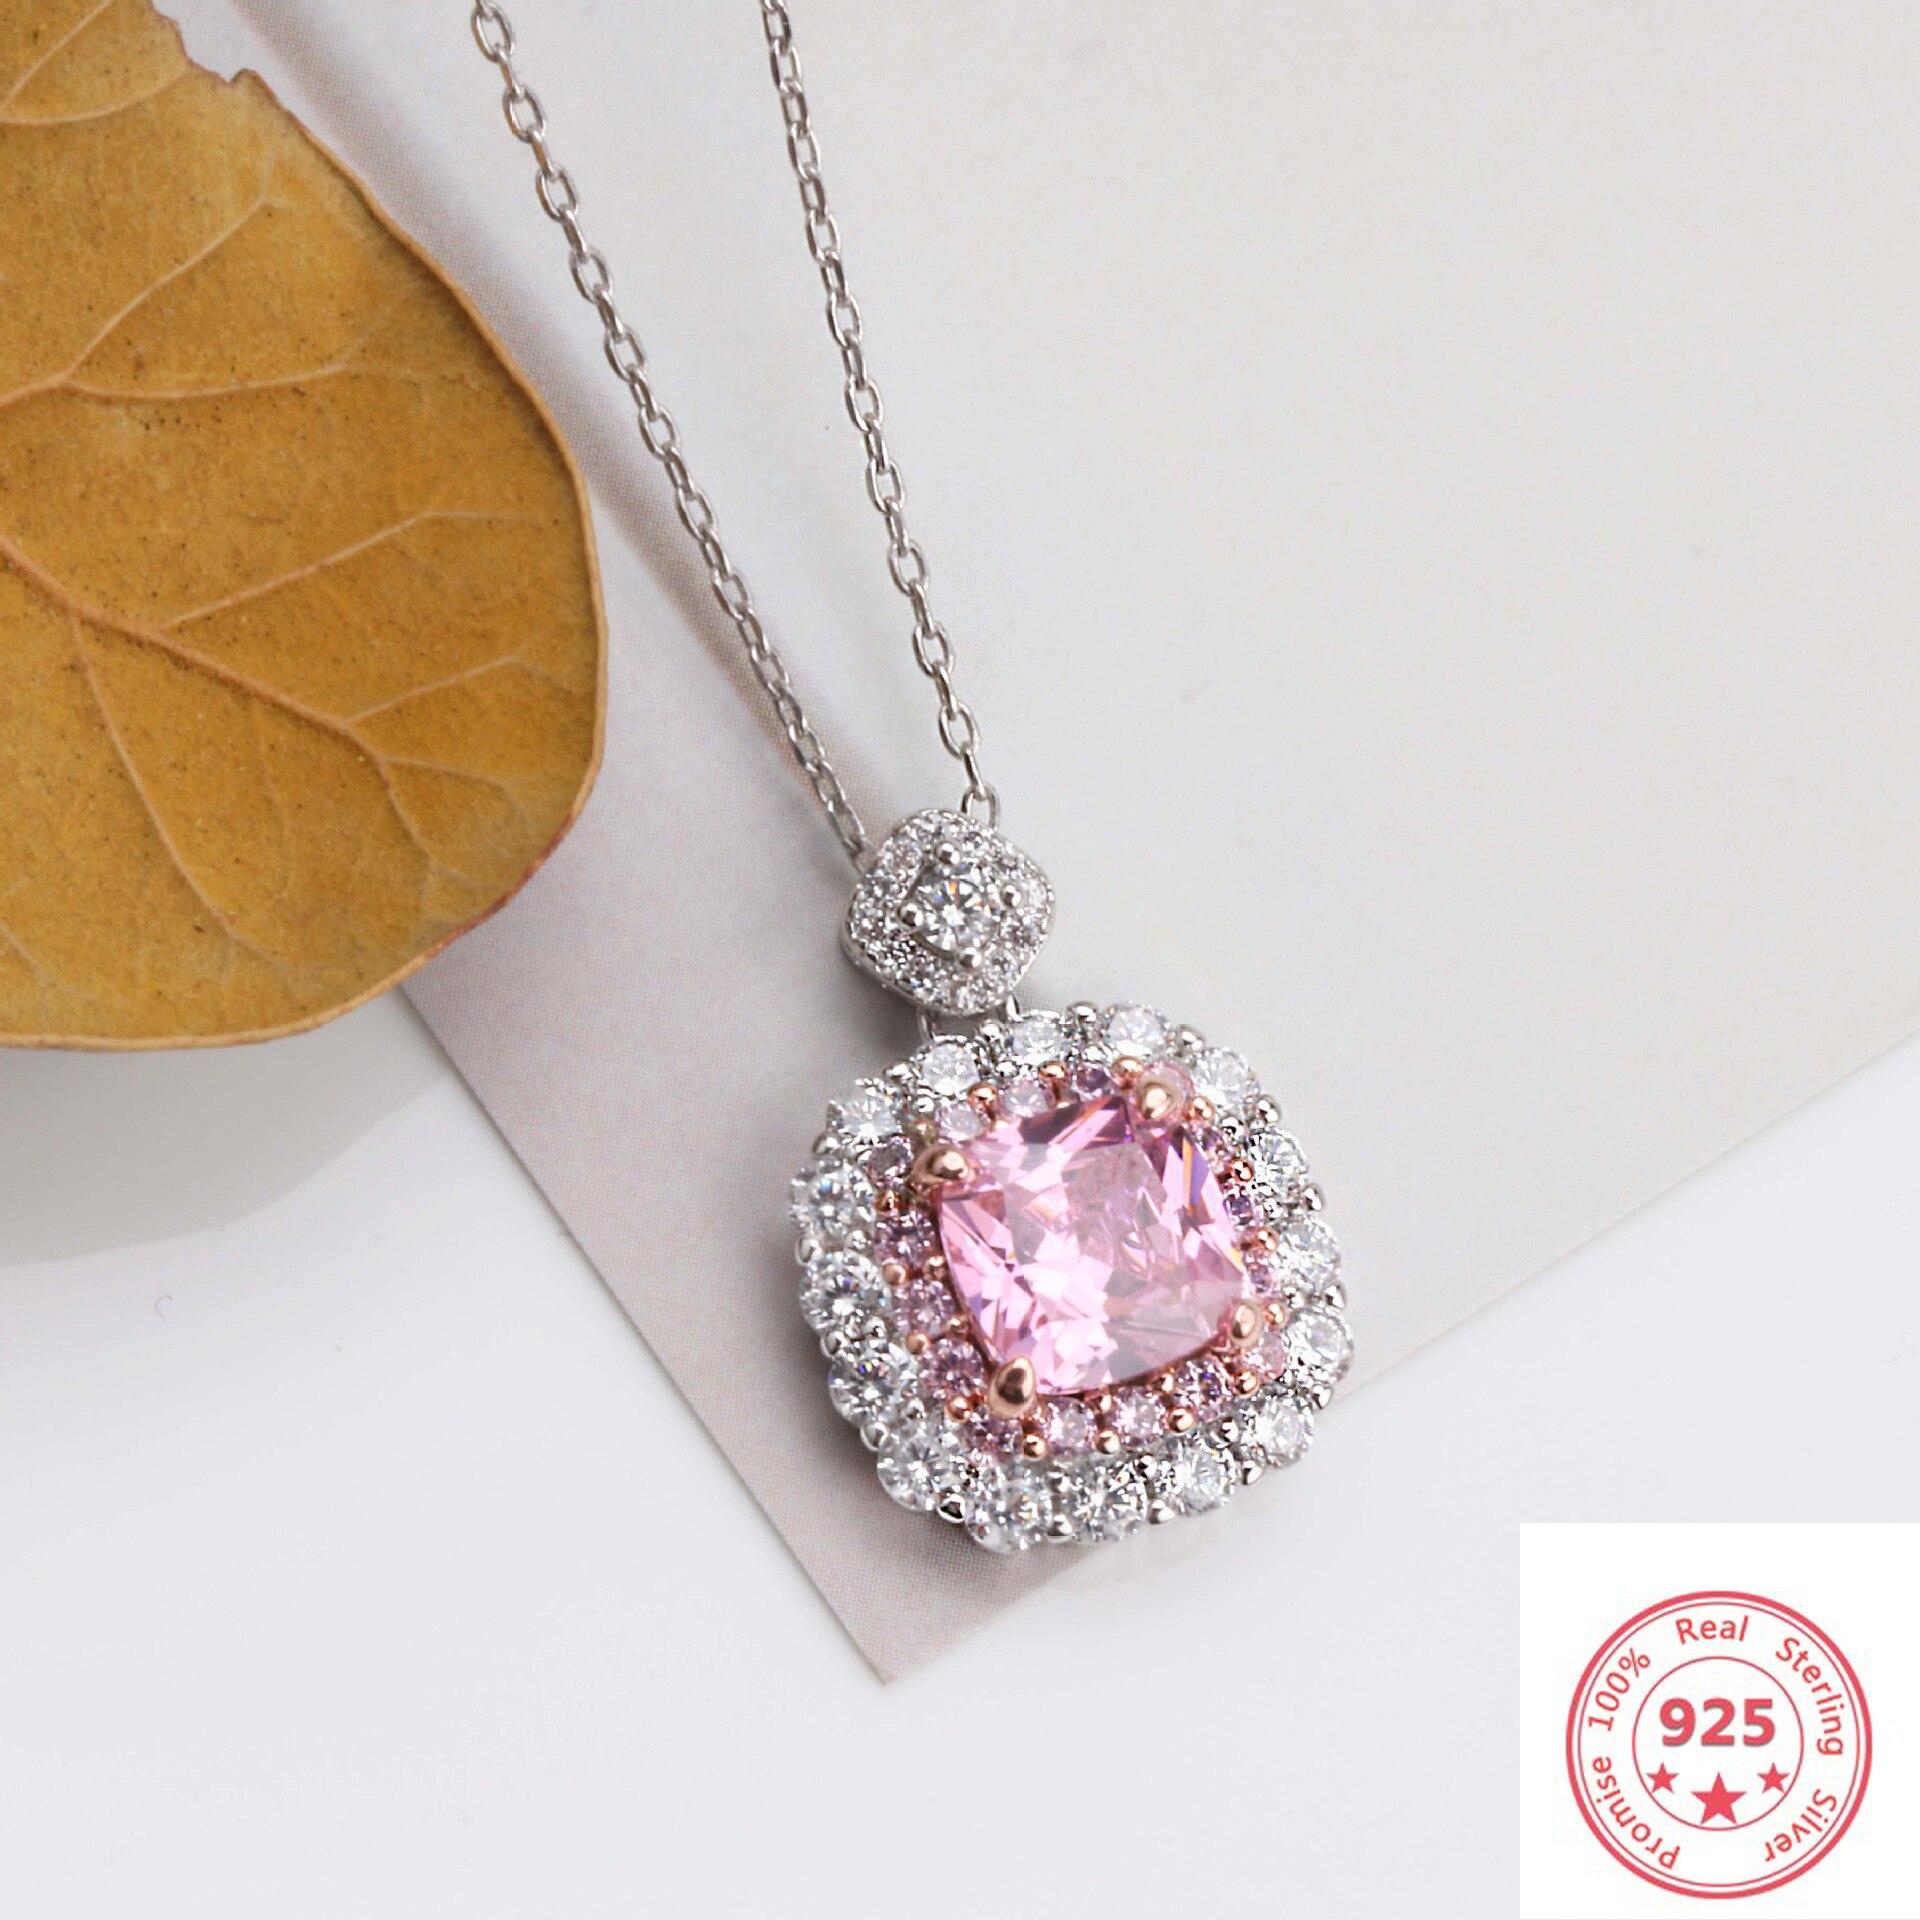 925 Sliver Sterling Necklace Pink VVS1 Diamond Pendants For Women Luxury Pierscionki Silver Jewelry Gemstone Bizuteria Pendant